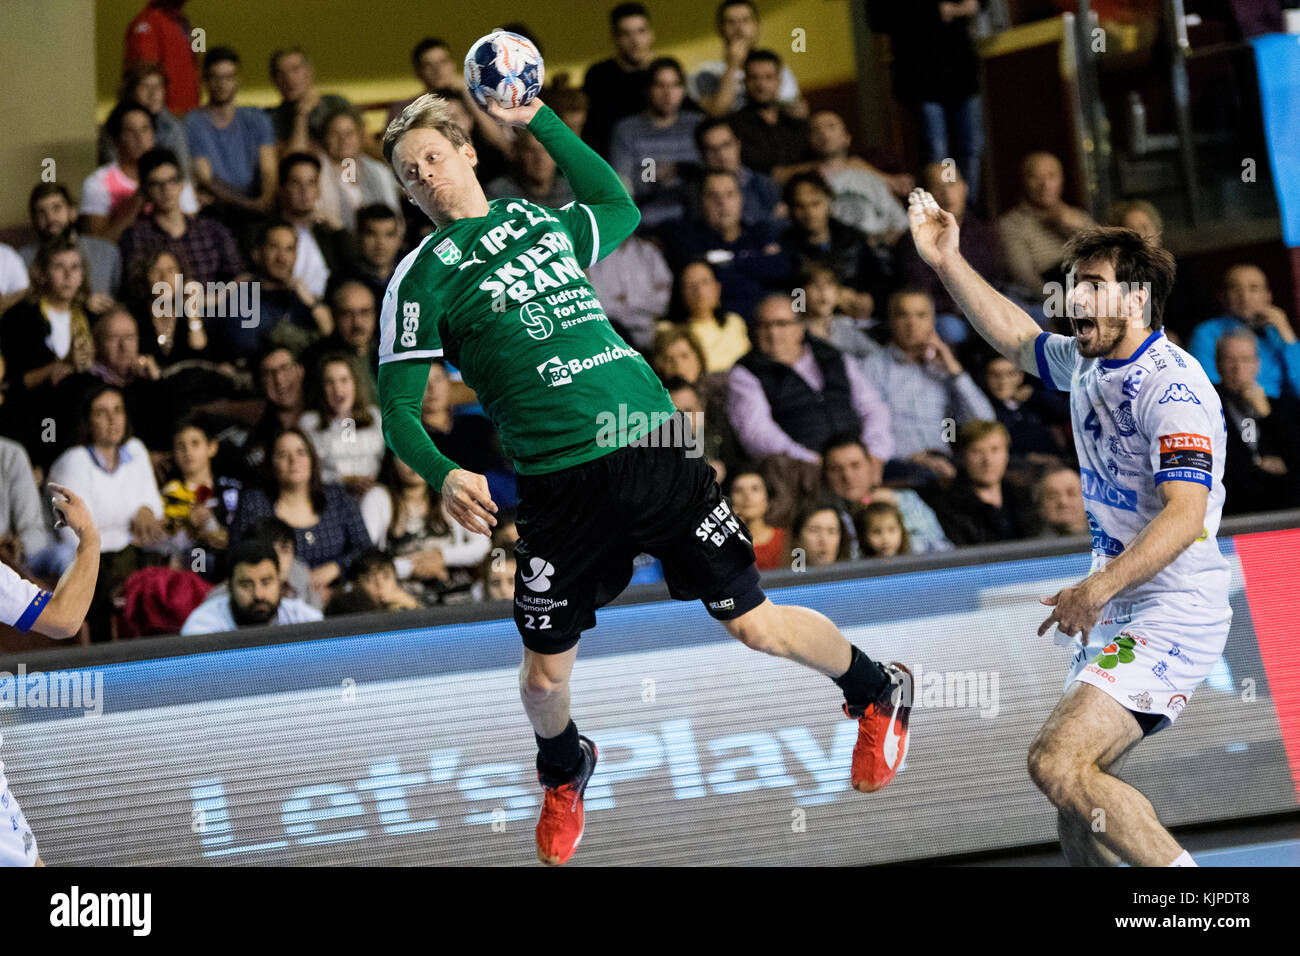 Leon, Spain. 25th November, 2017. Rasmusen R. (Skjern Handbold) in action during the handball match of 2017/2018 - Stock Image